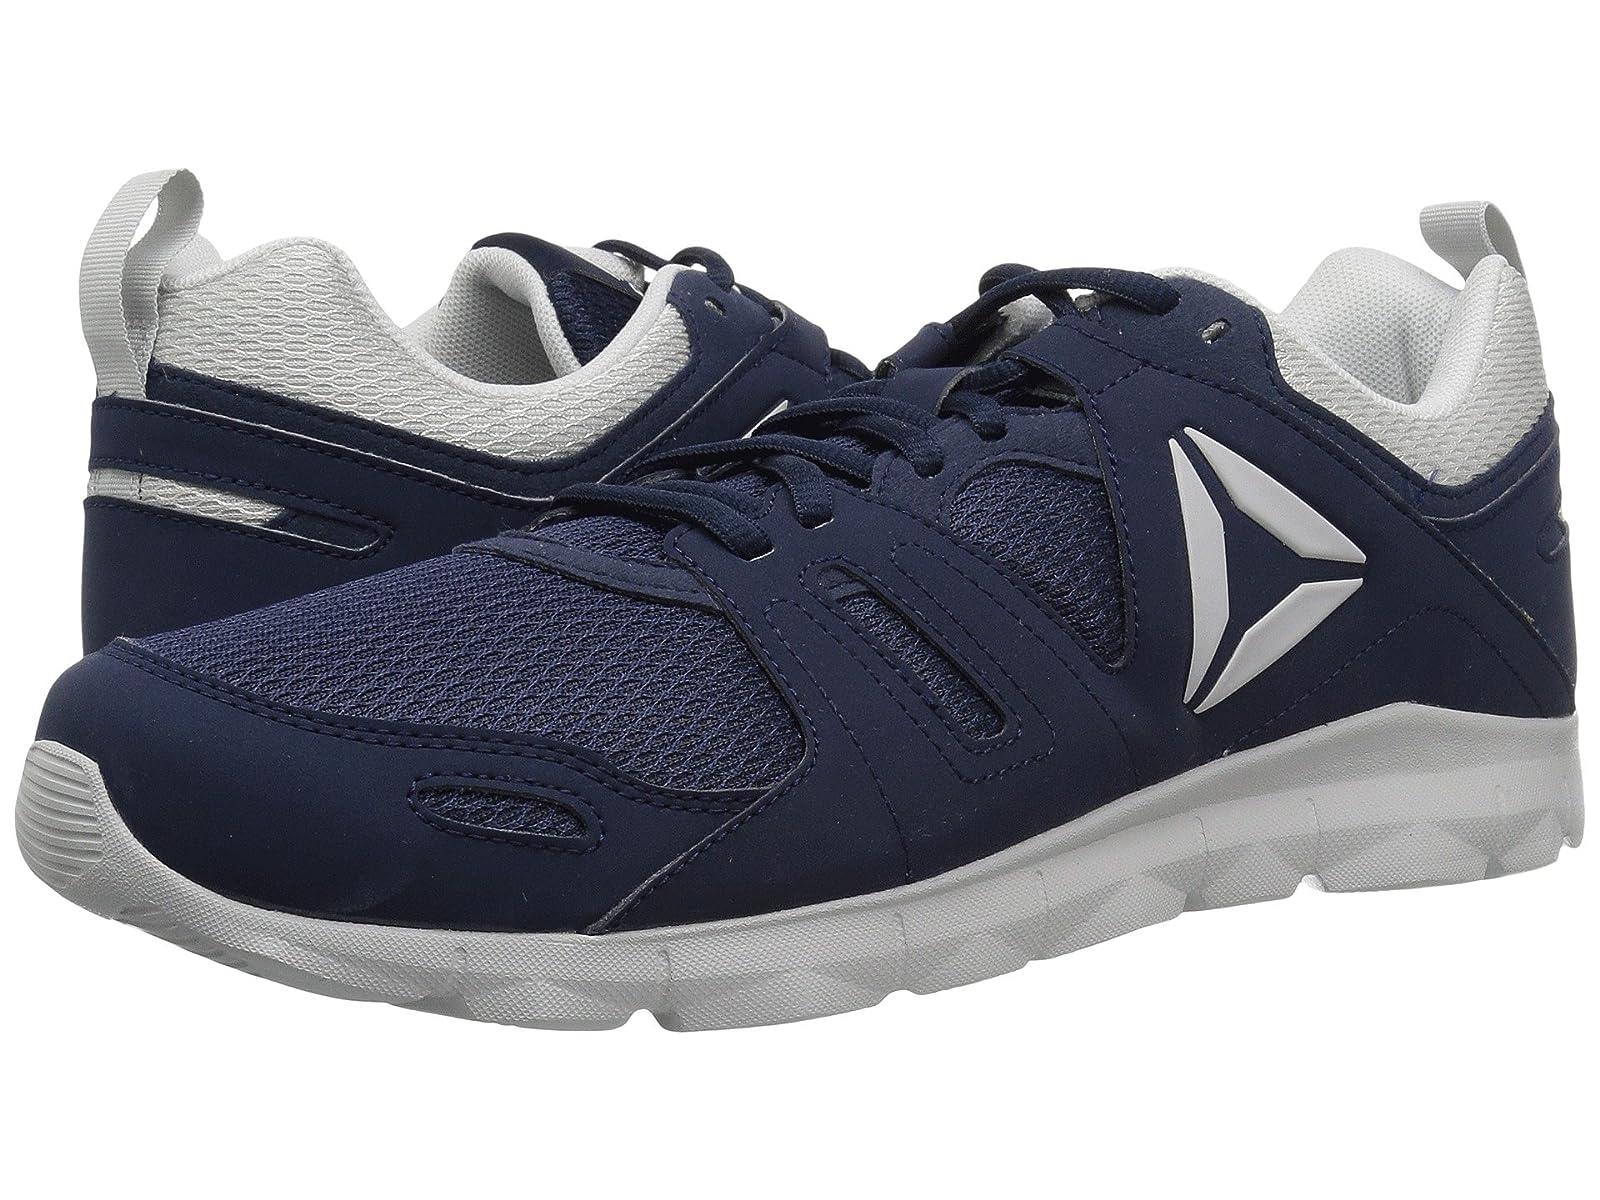 Reebok Dashhex TR 2.0Cheap and distinctive eye-catching shoes